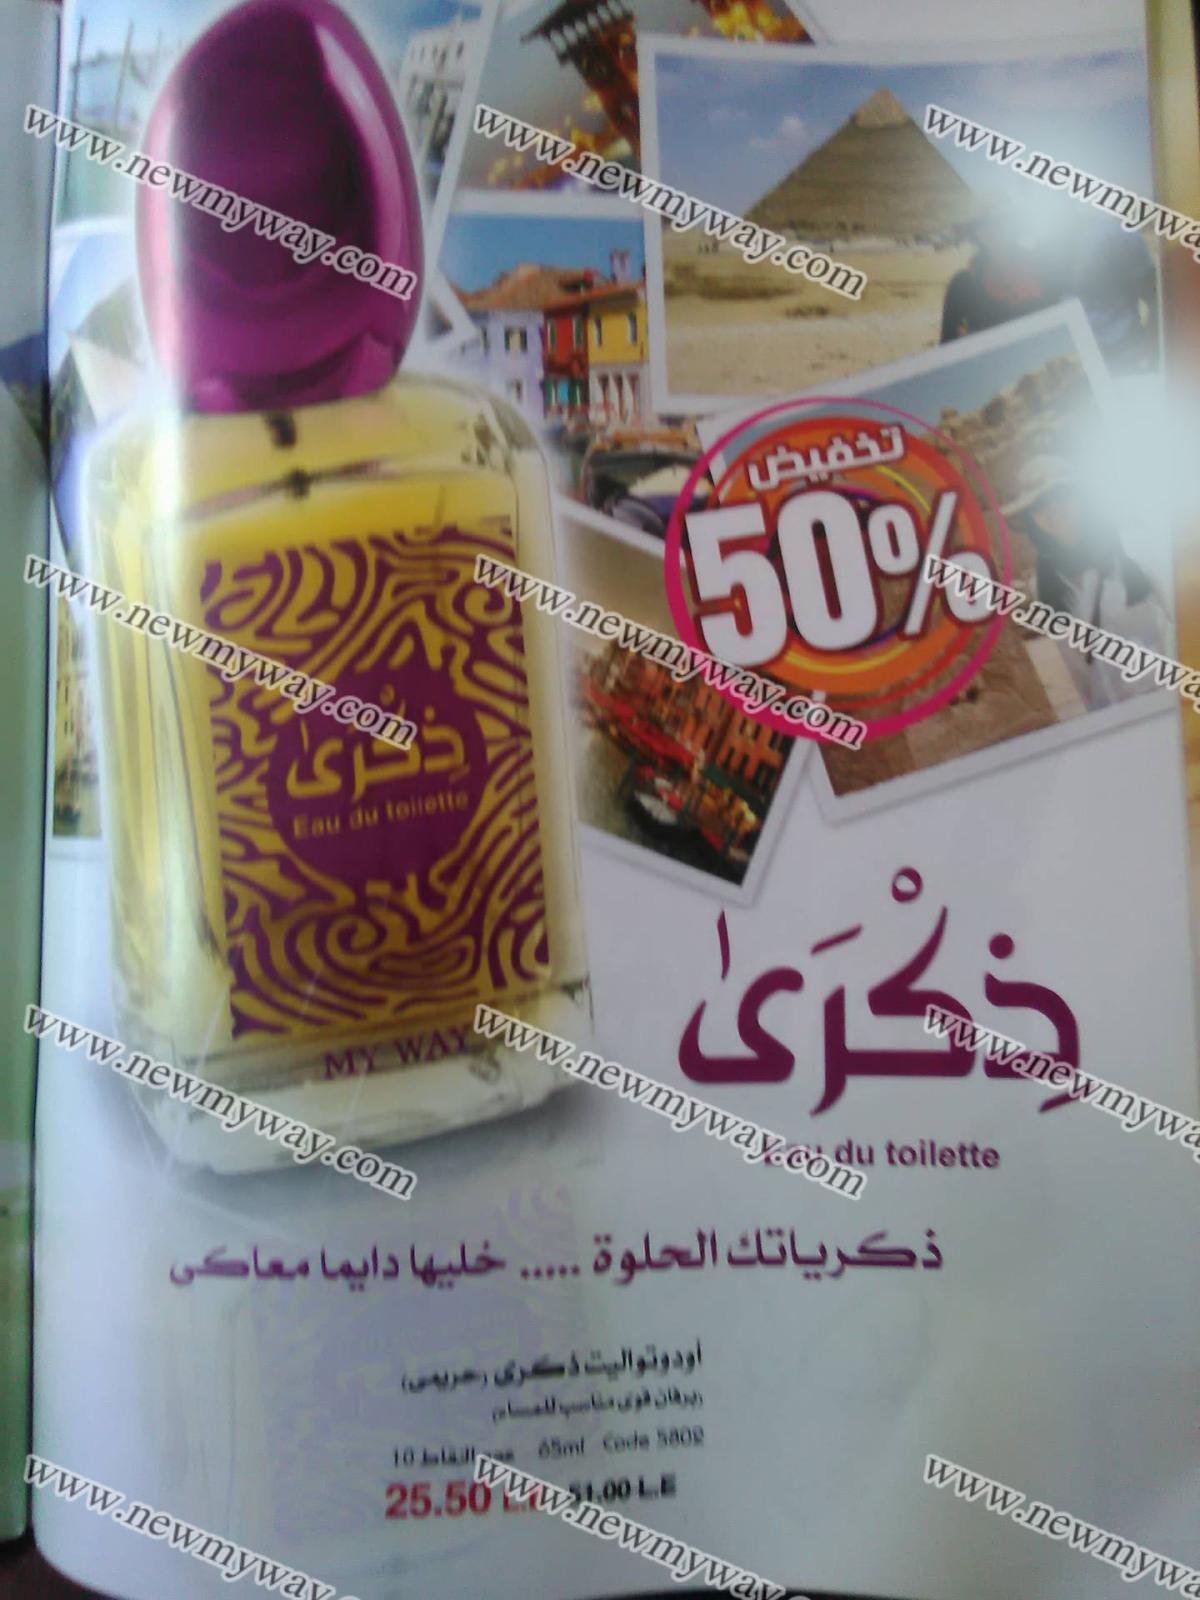 حصرياااا بالصور .. أقوى عروض كتالوج شهر 9 سبتمبر 2016 منها خصم 50 % على تندر من ماى واى فى مصر  5pos92